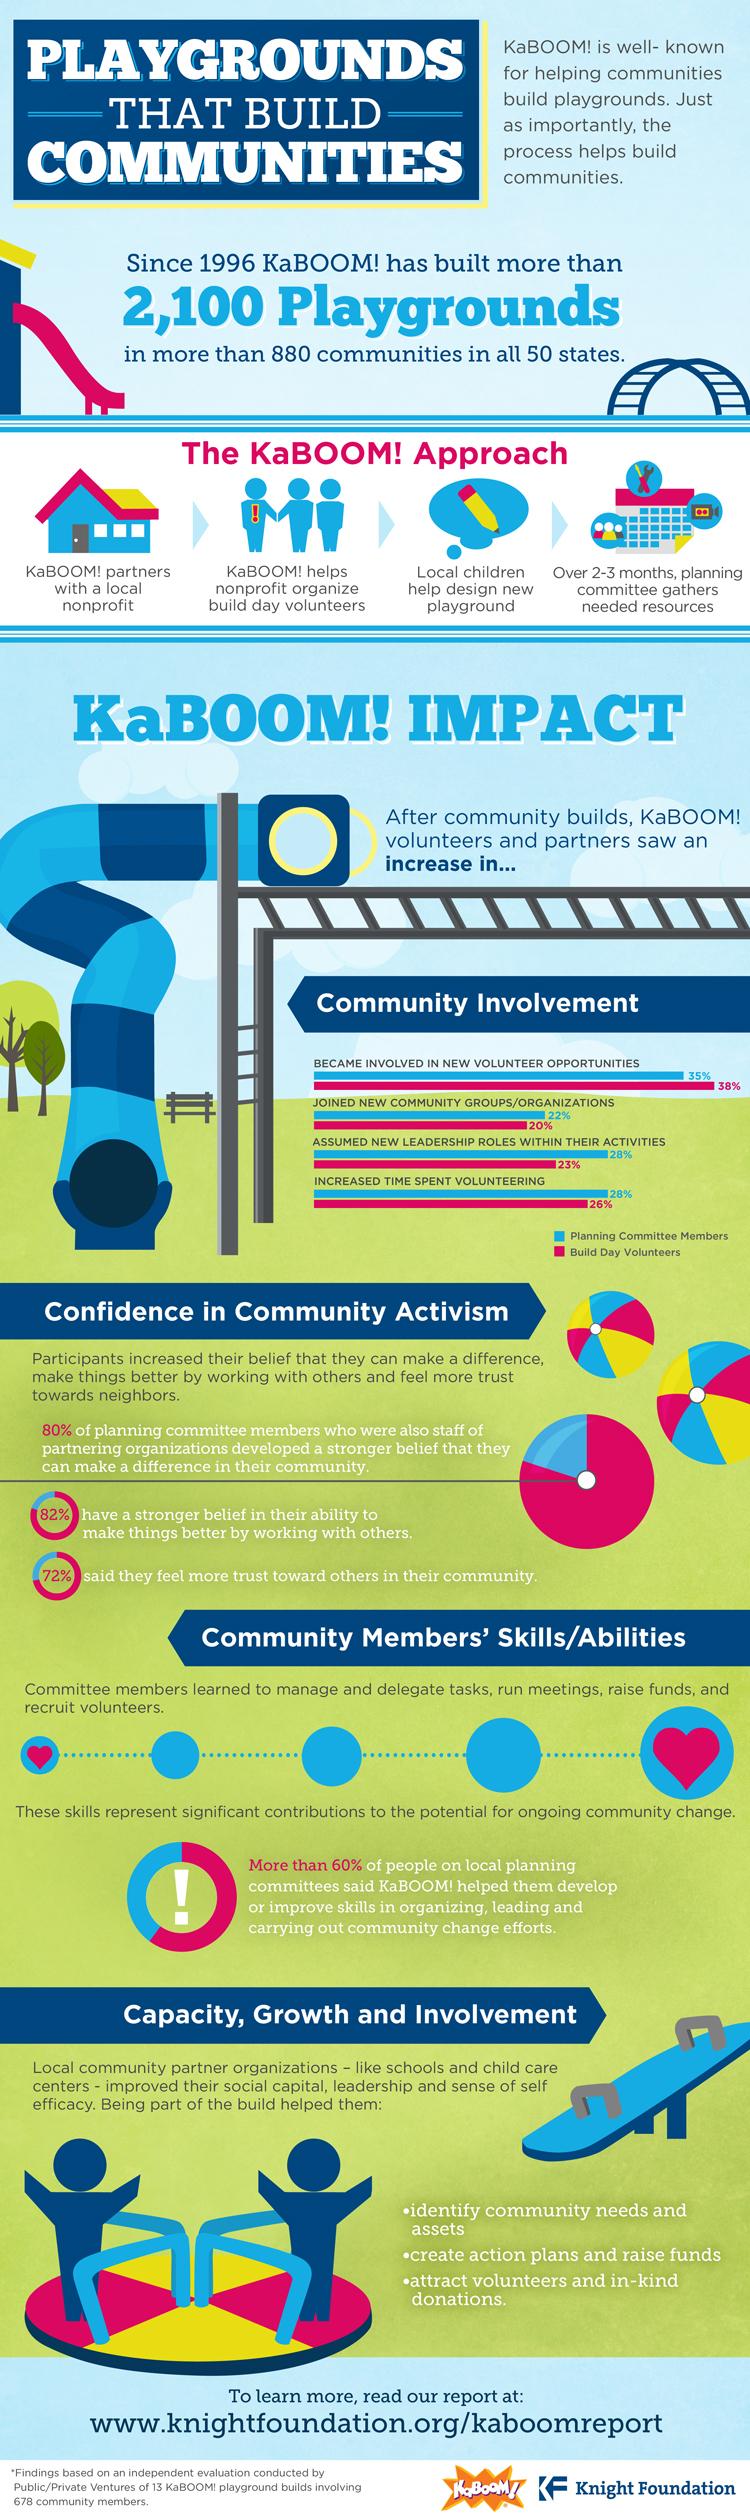 KaBOOM Playgrounds That Build Communities